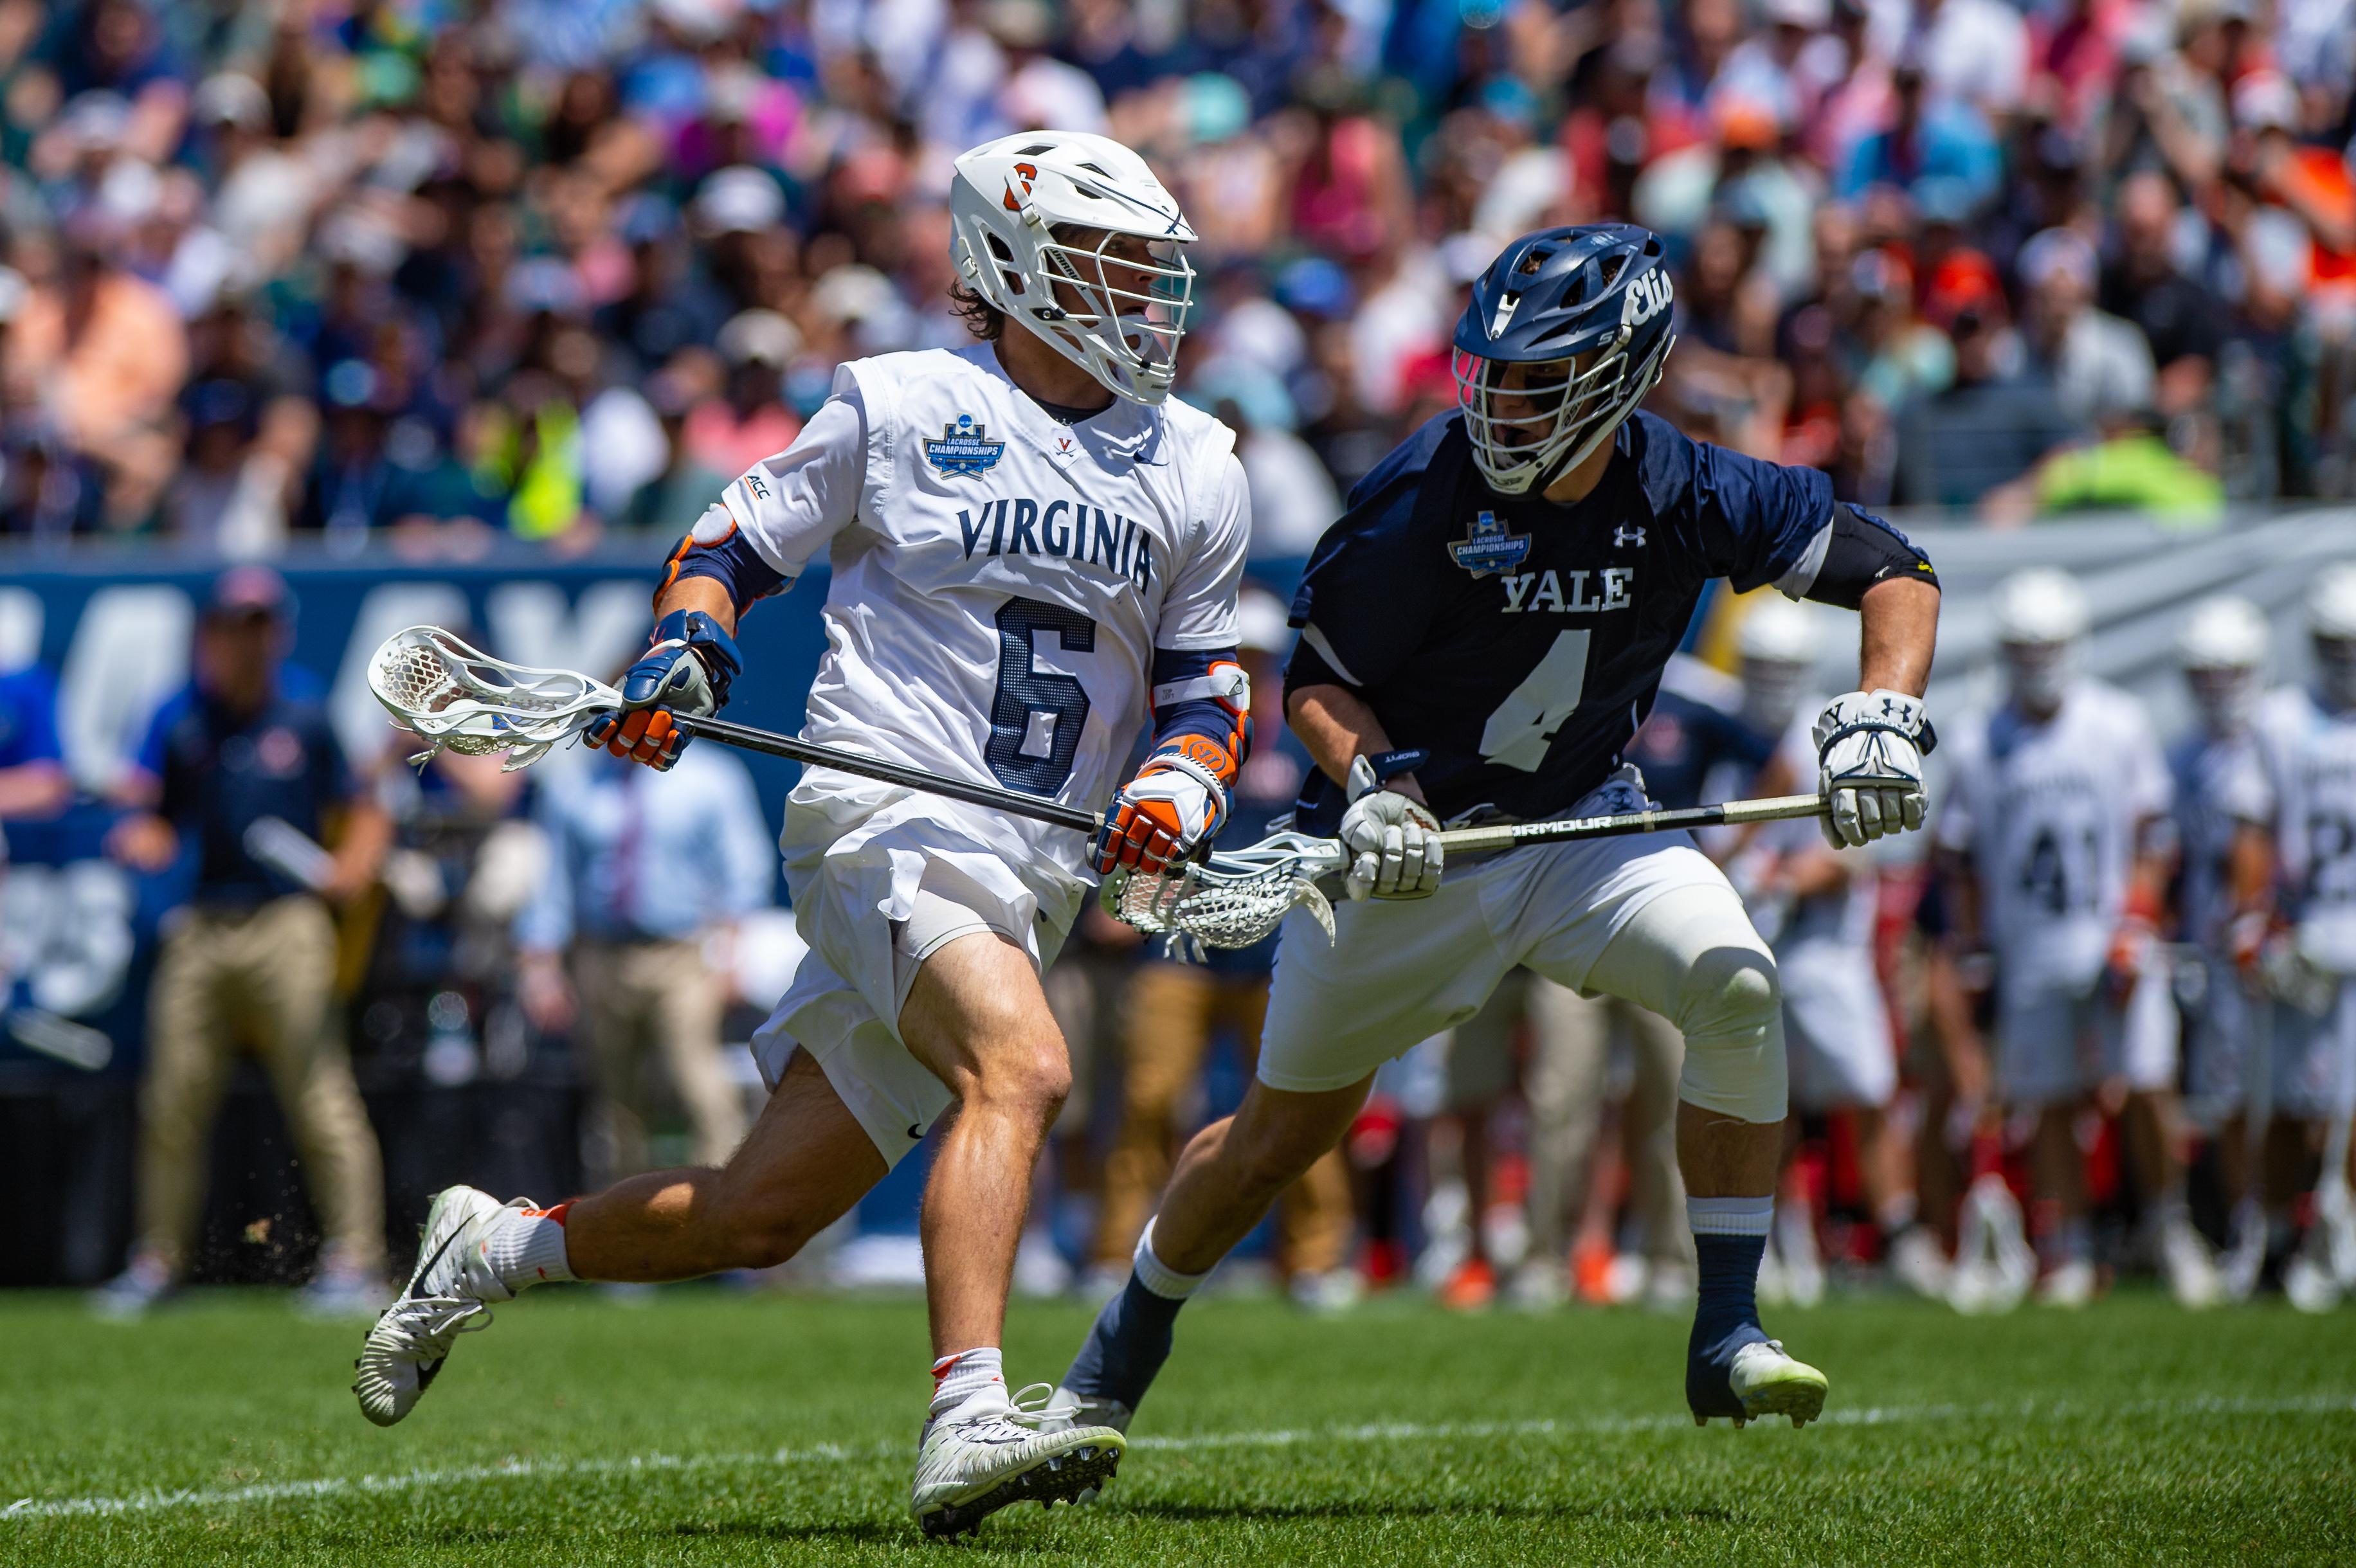 NCAA LACROSSE: MAY 27 NCAA Lacrosse Championships